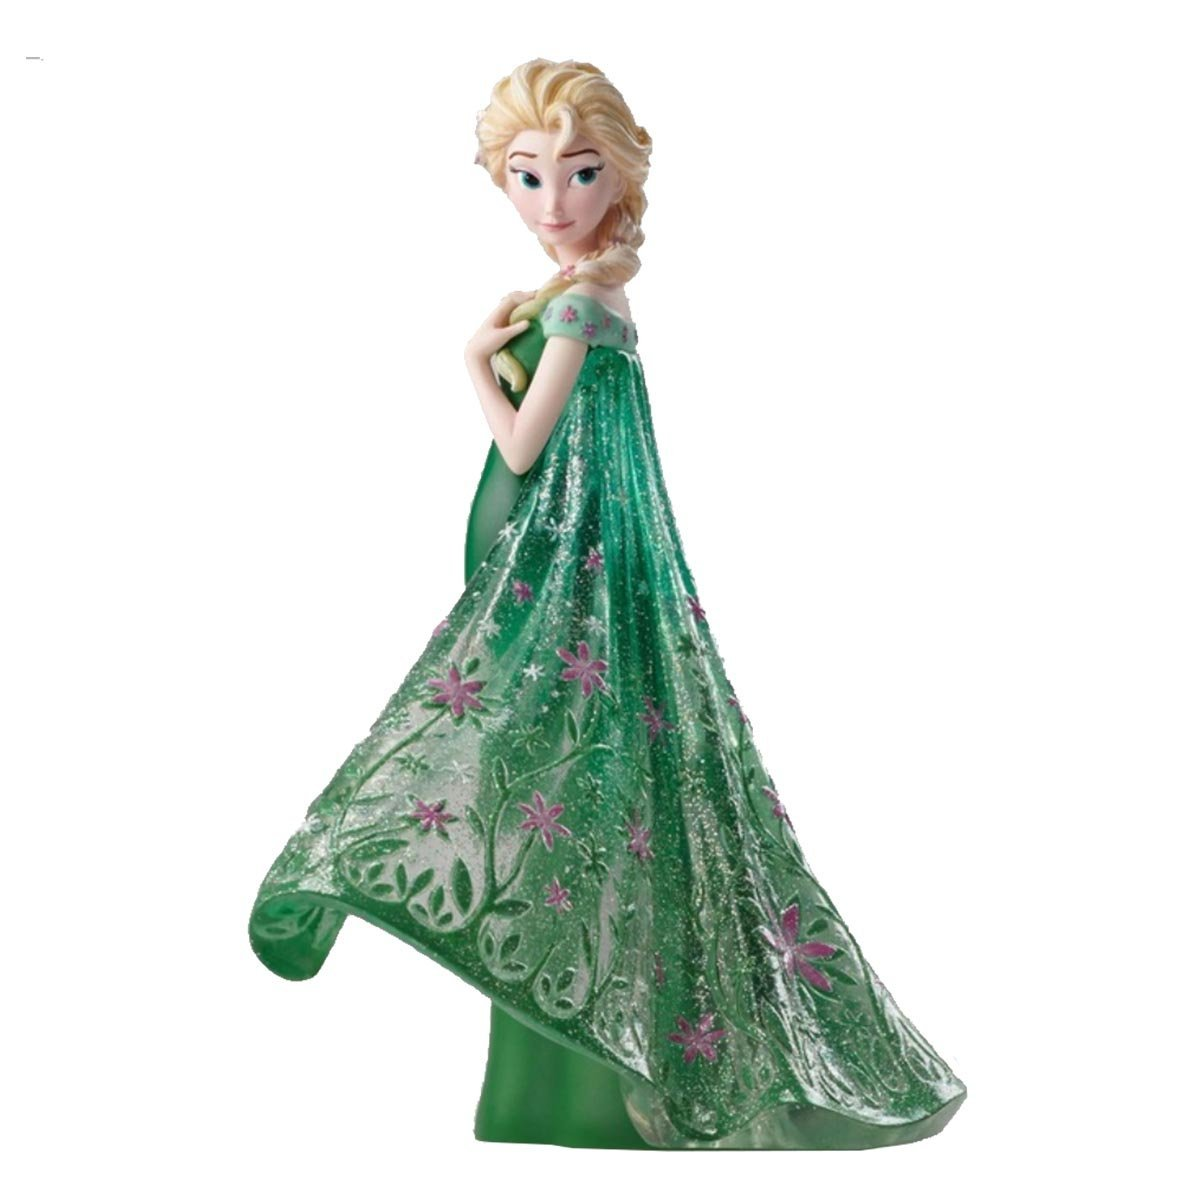 Disney Traditions Showcase Frozen Fever Elsa Figure